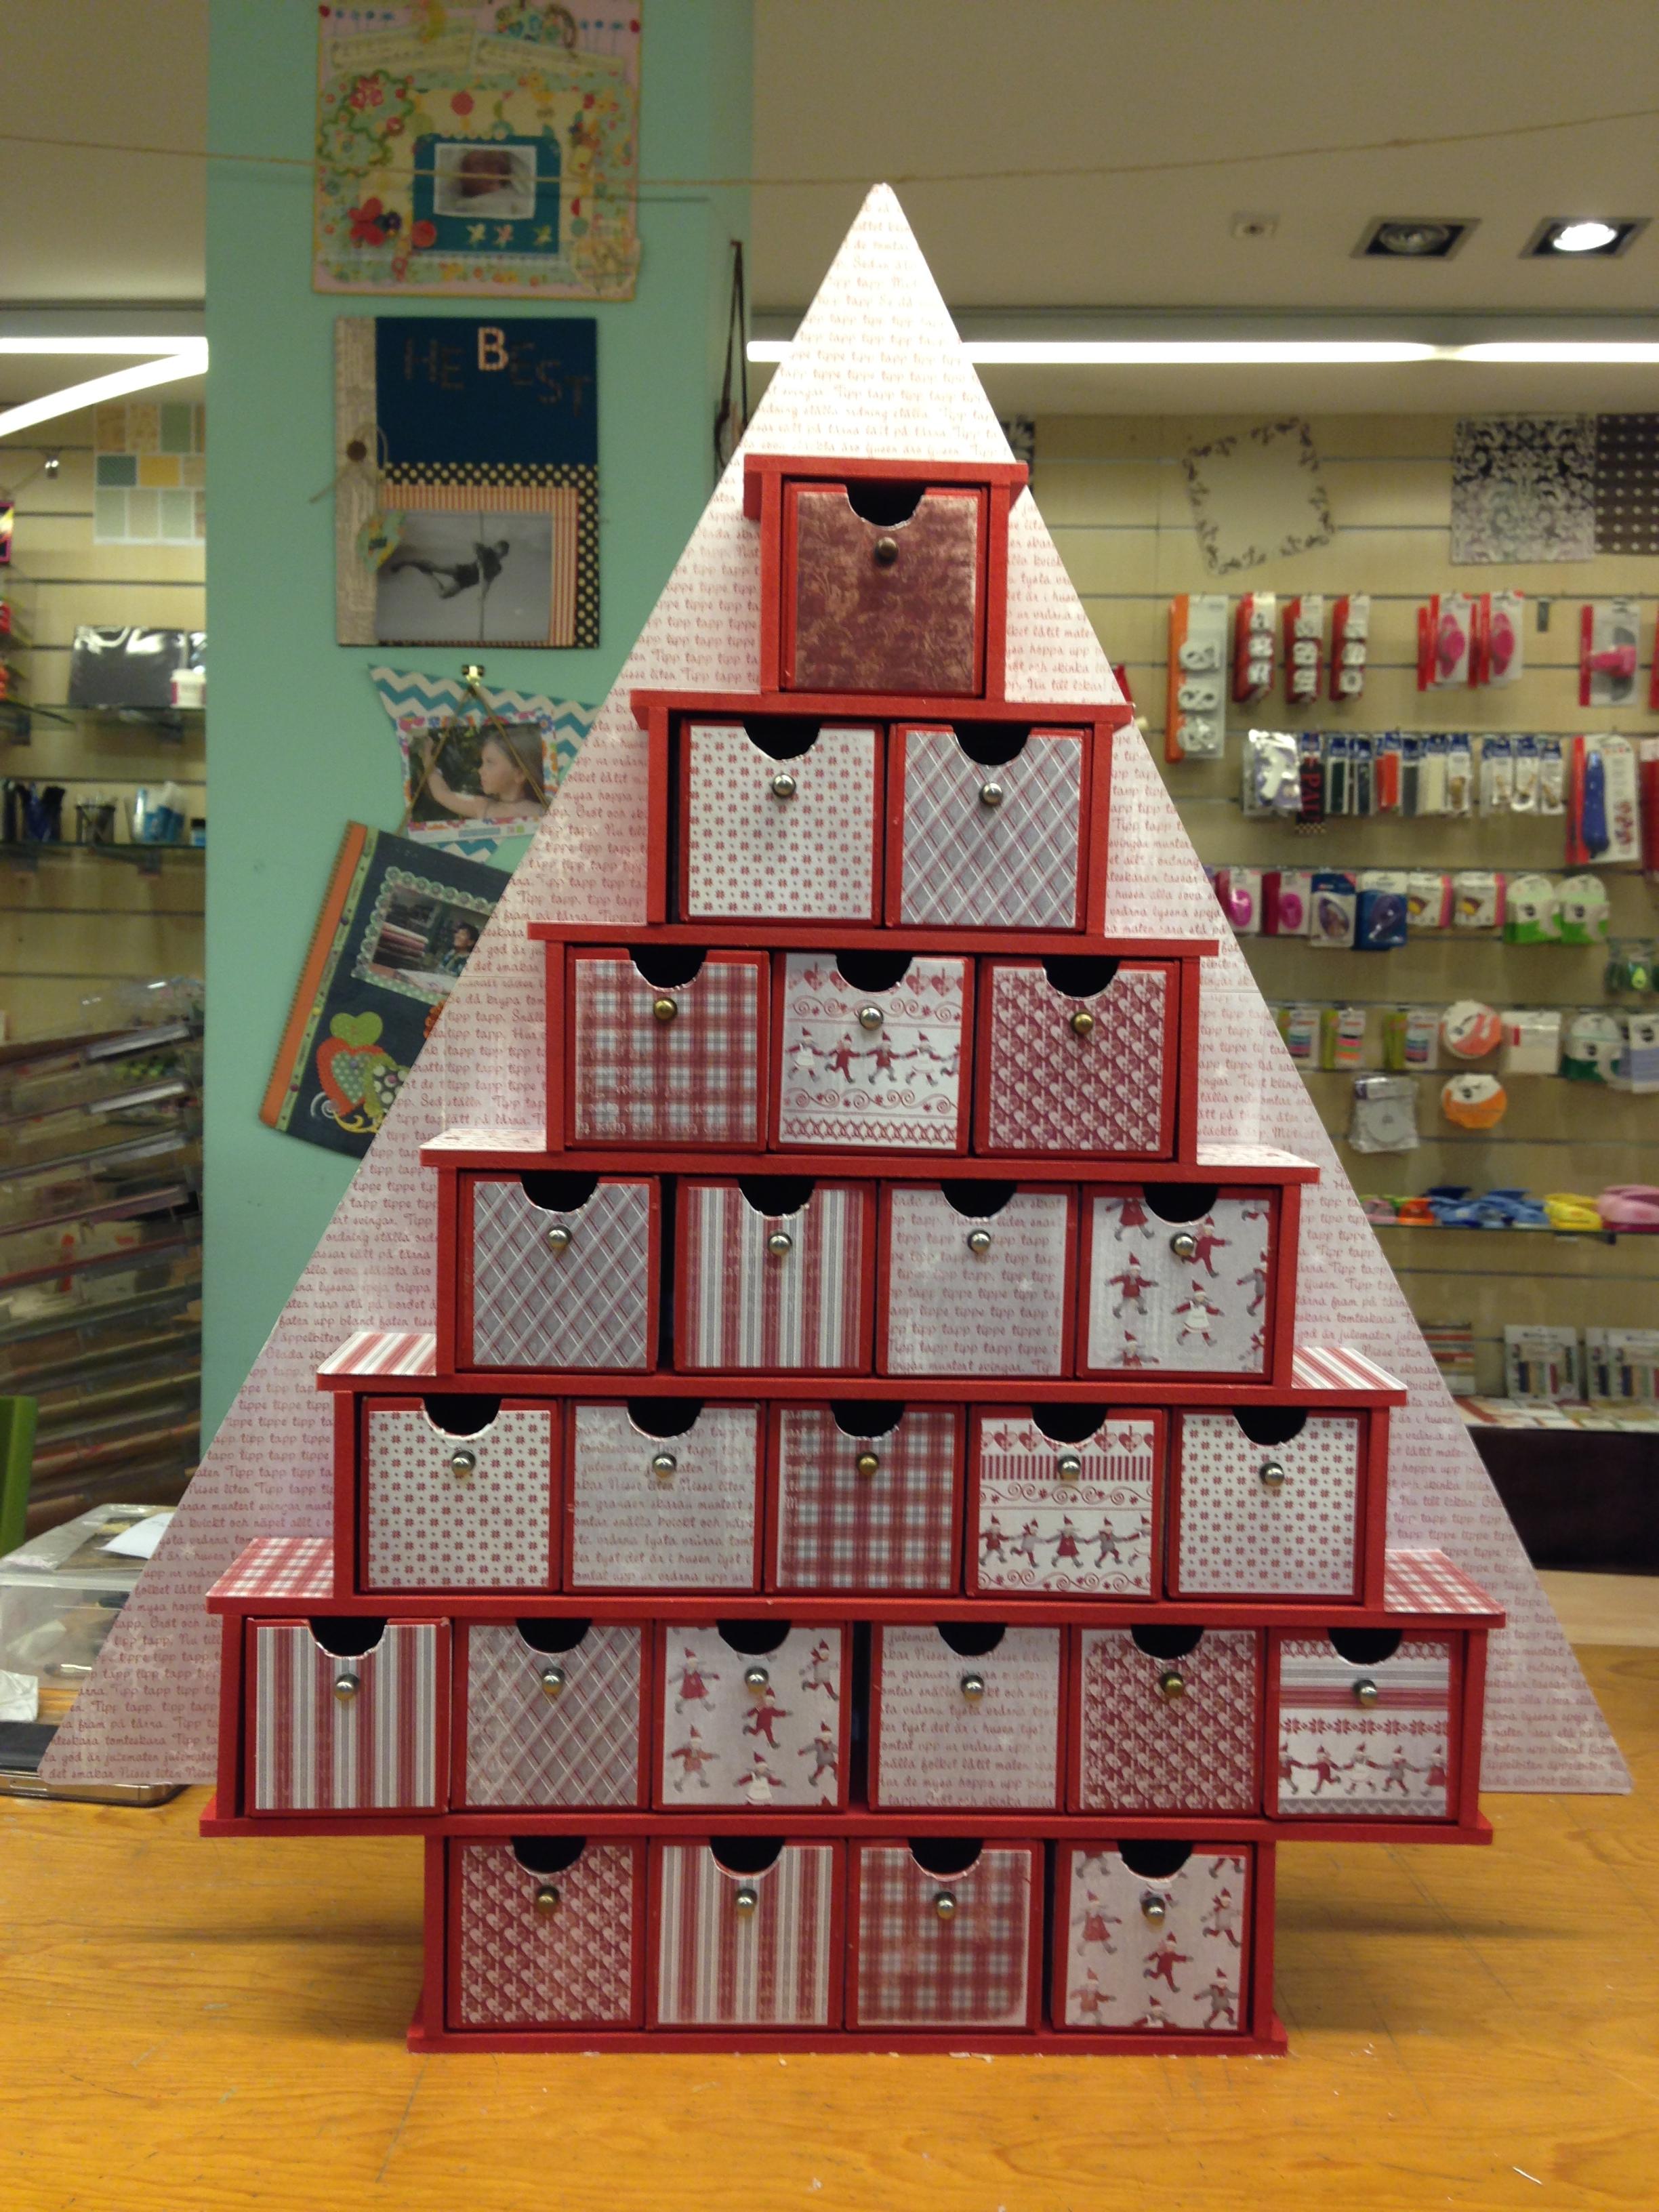 Calendario de adviento arbolito navidad pinterest for Calendario adviento ikea